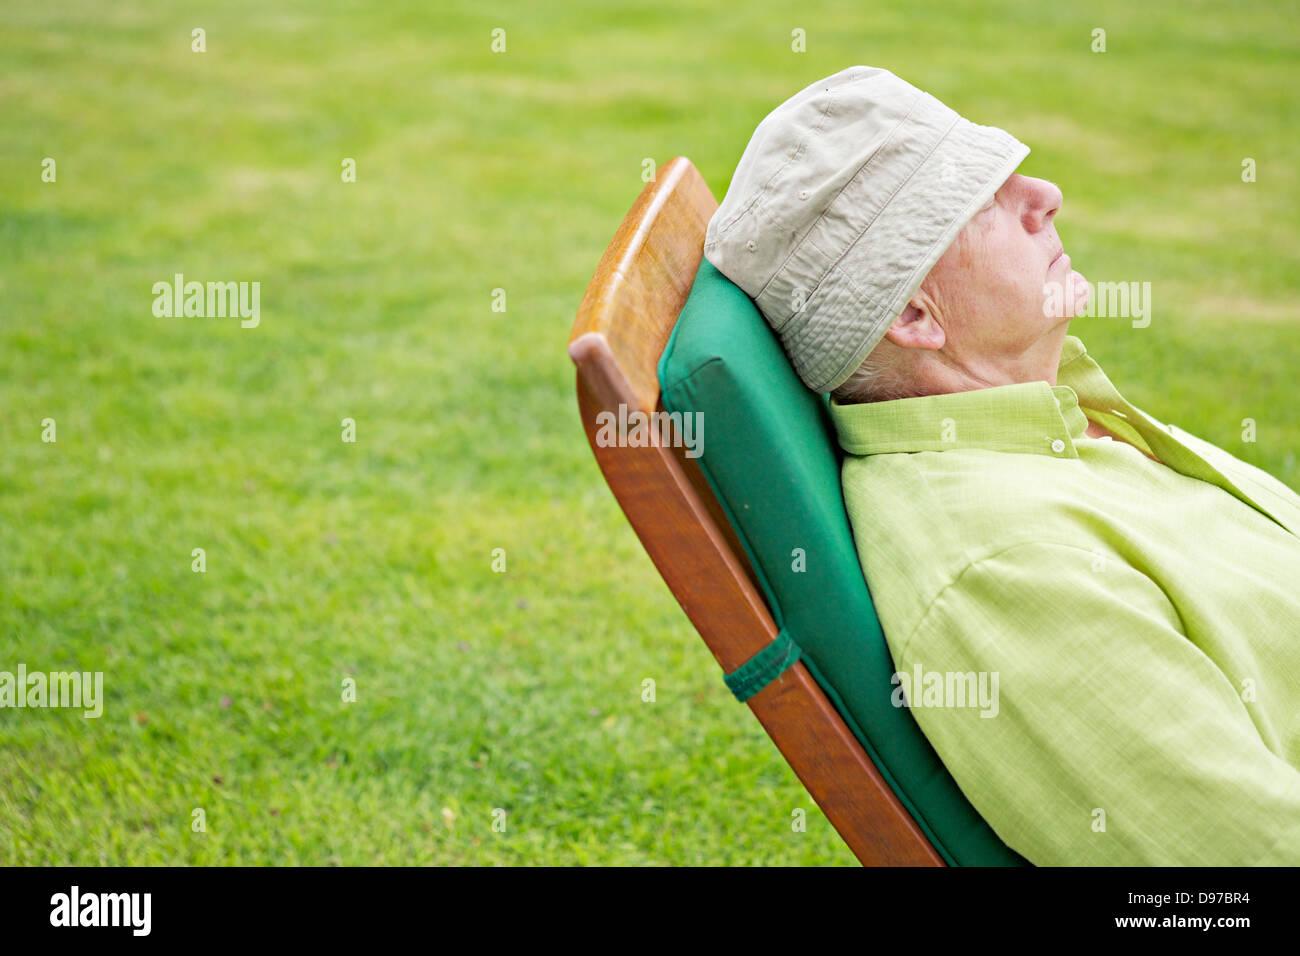 Seventies Man Retired - Snoozing - Stock Image